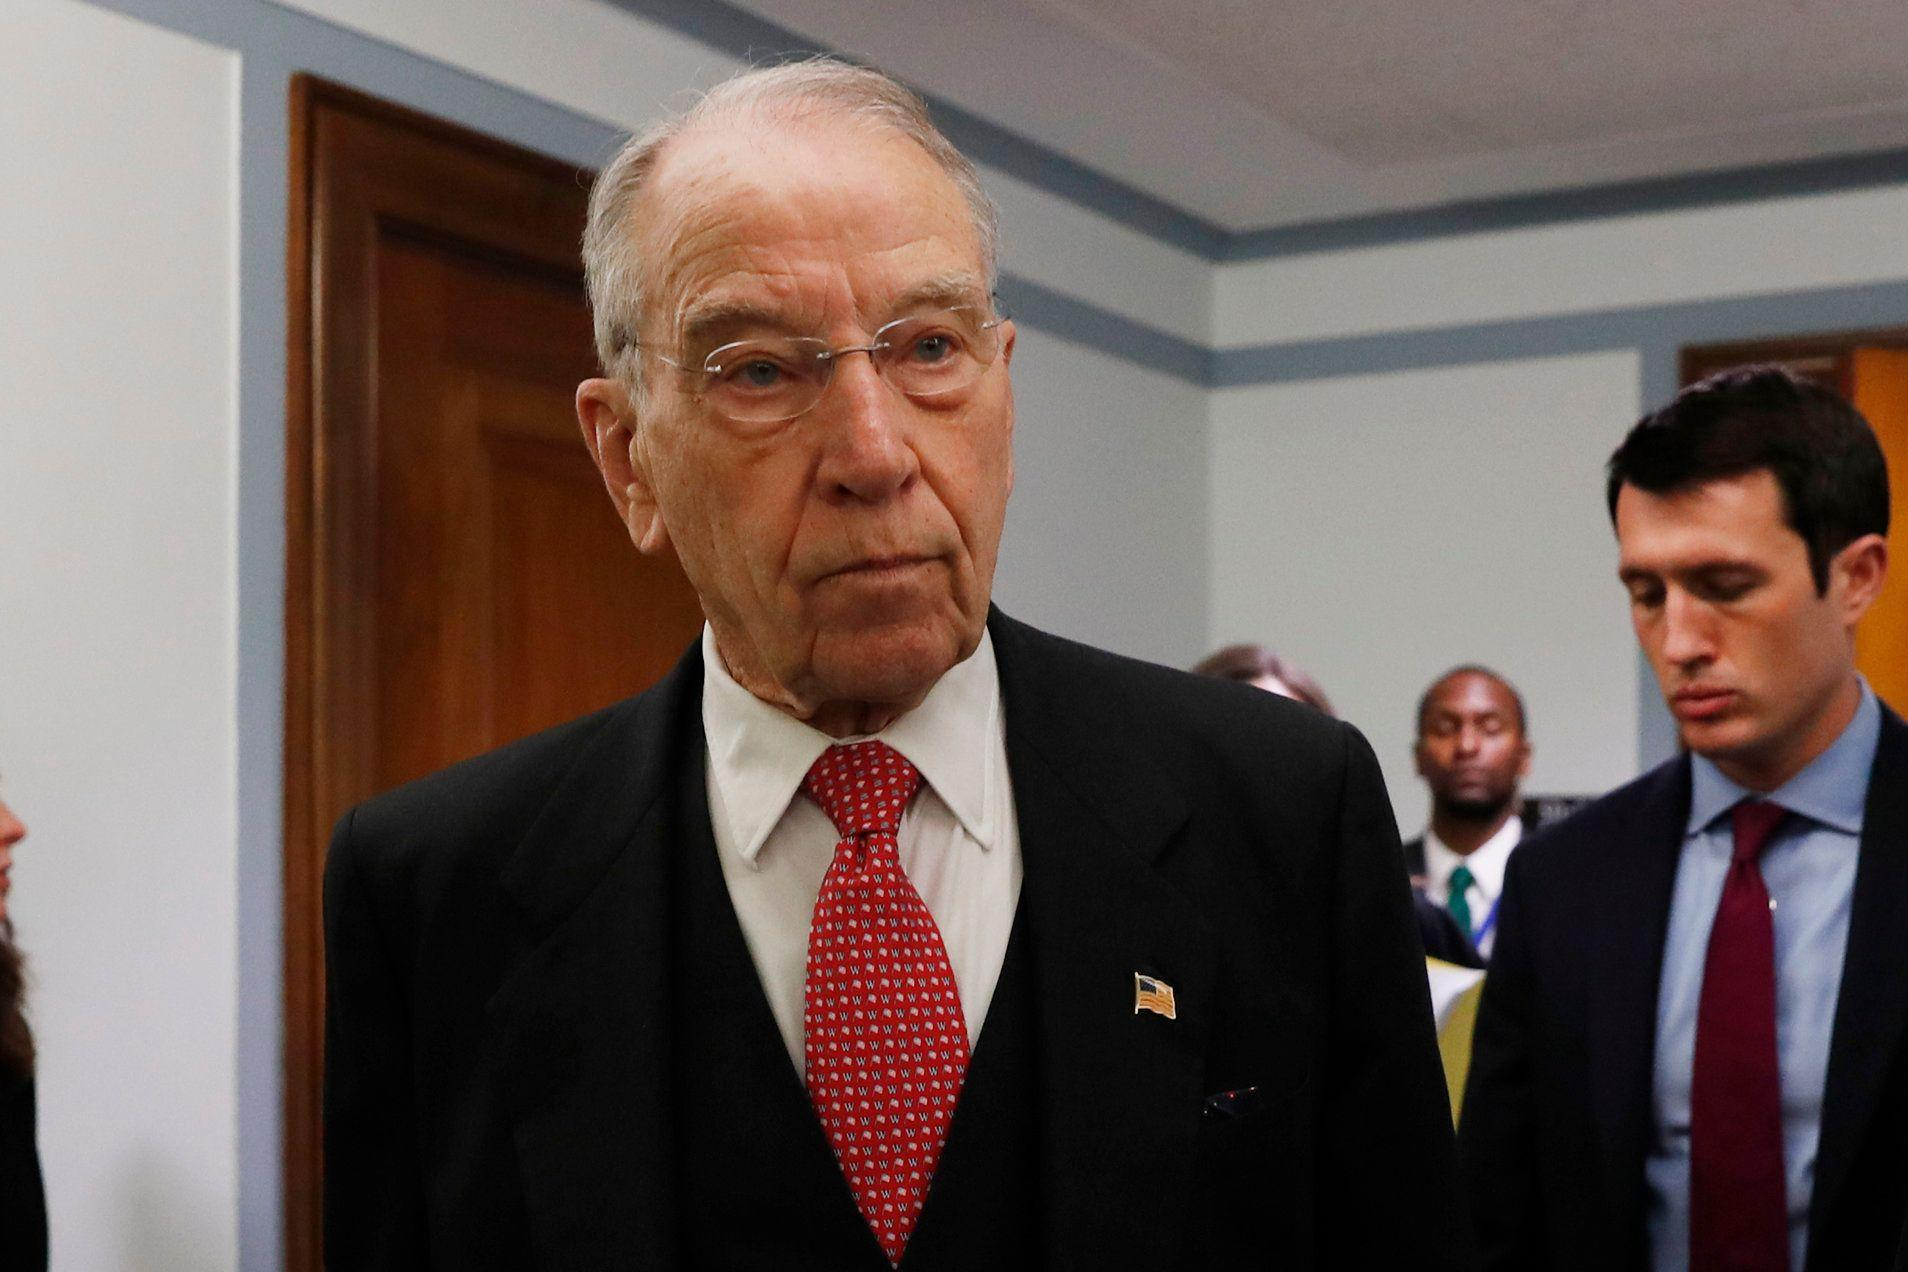 Senators grill pharma execs over prescription drug prices